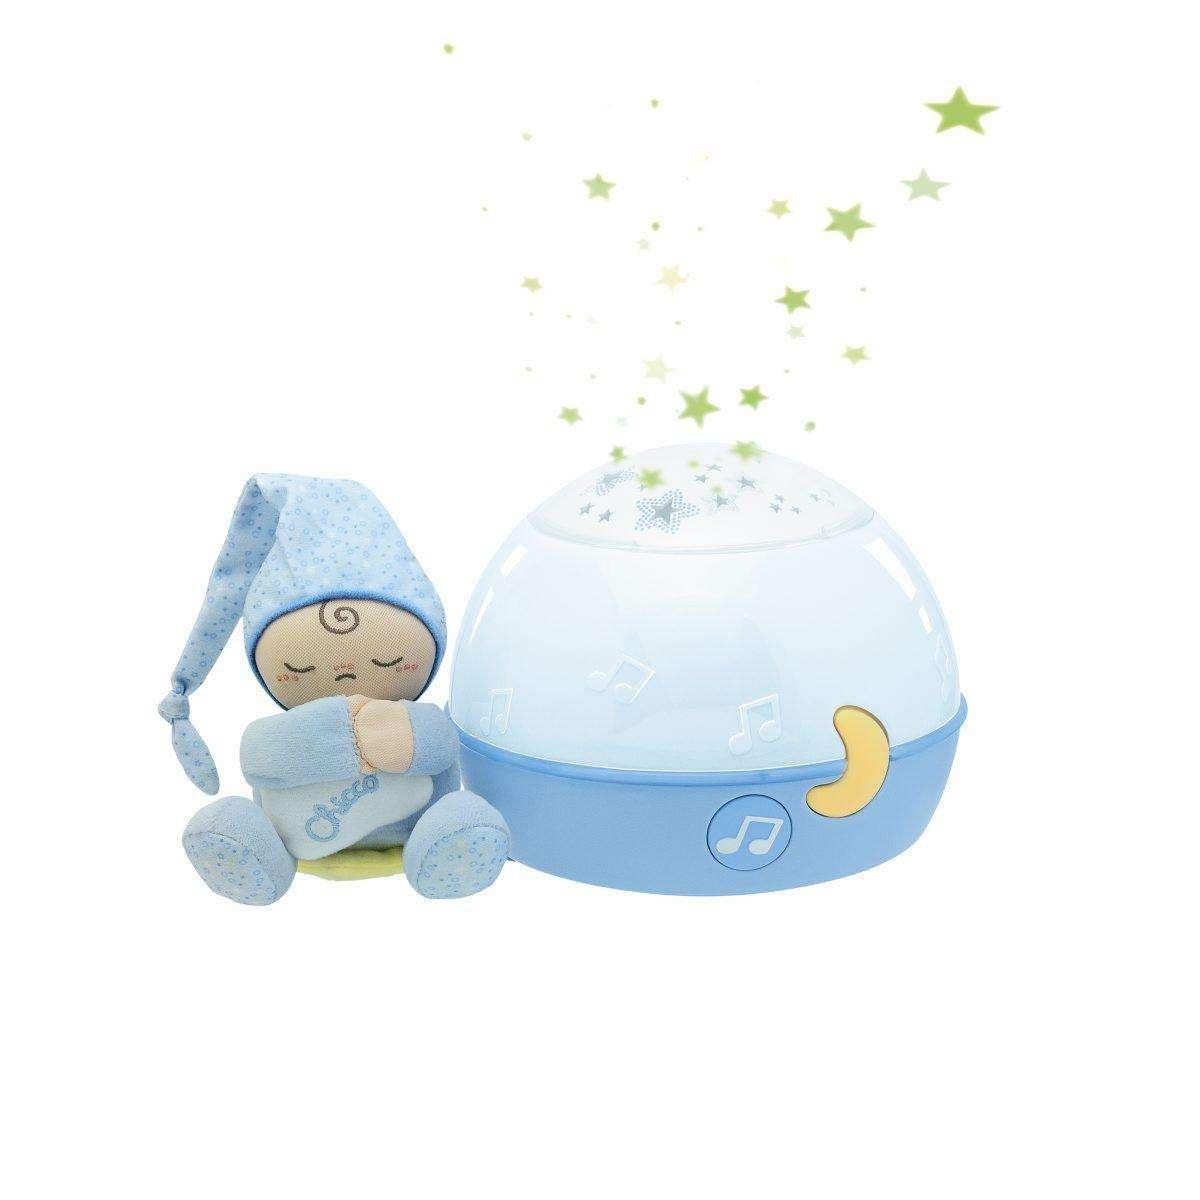 Good Night Stars Baby Light Projector Baby Projector